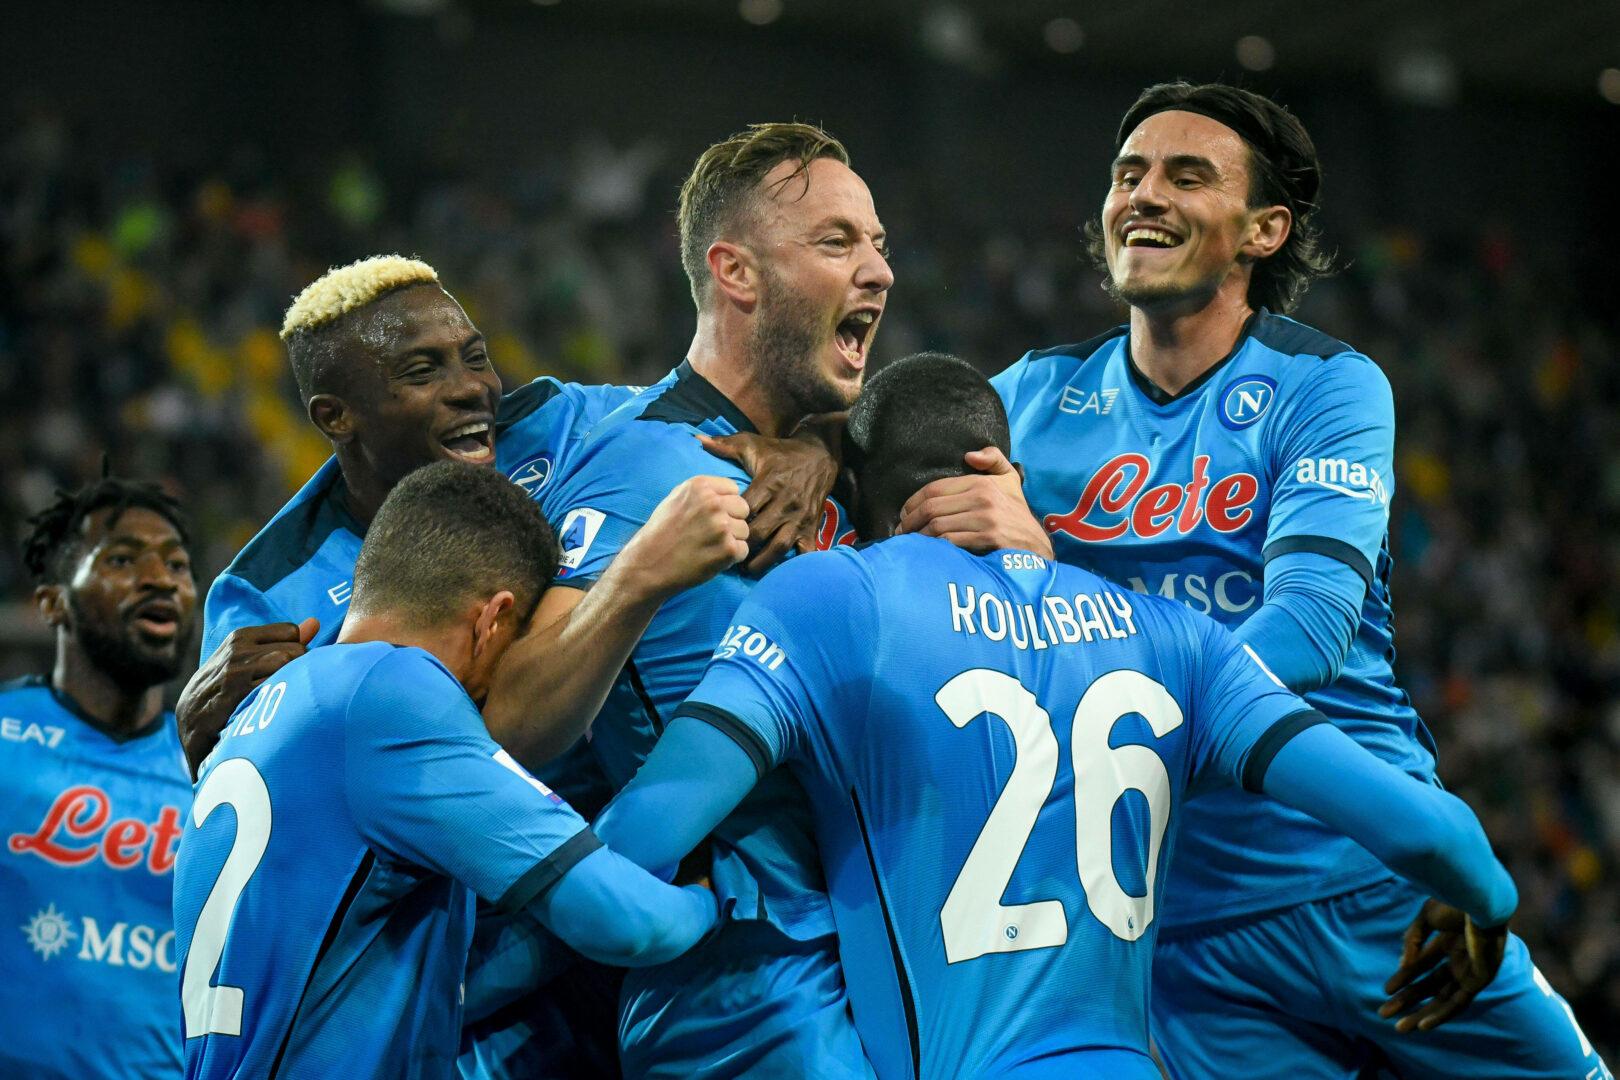 Napoli Team bejubelt Tor von Rrahmani